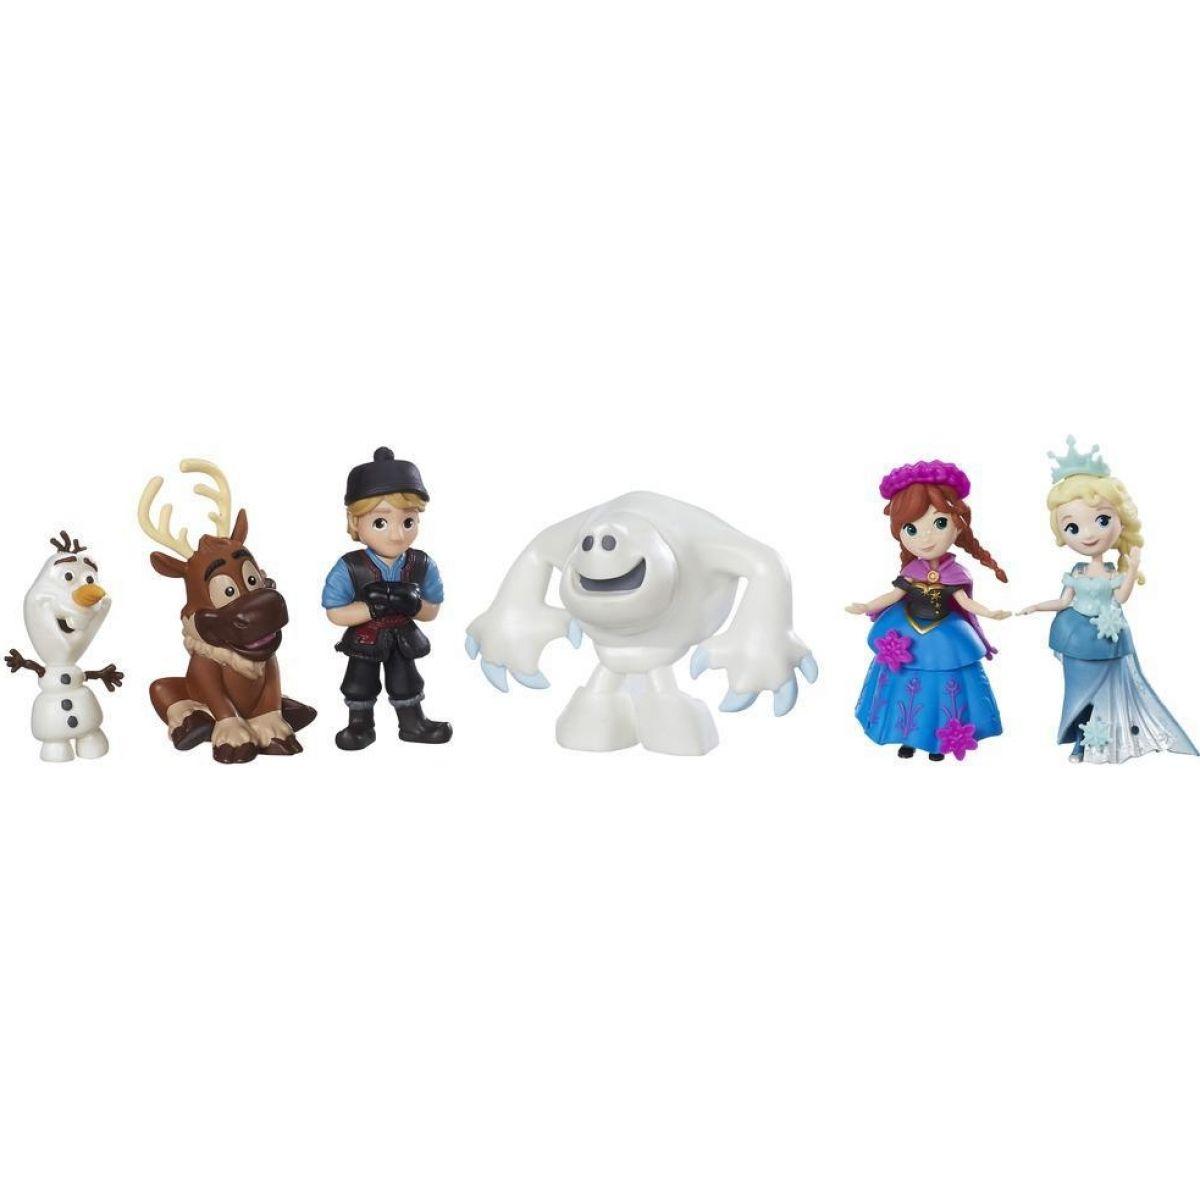 Hasbro Disney Frozen Mini hrací set 6 postav z filmu